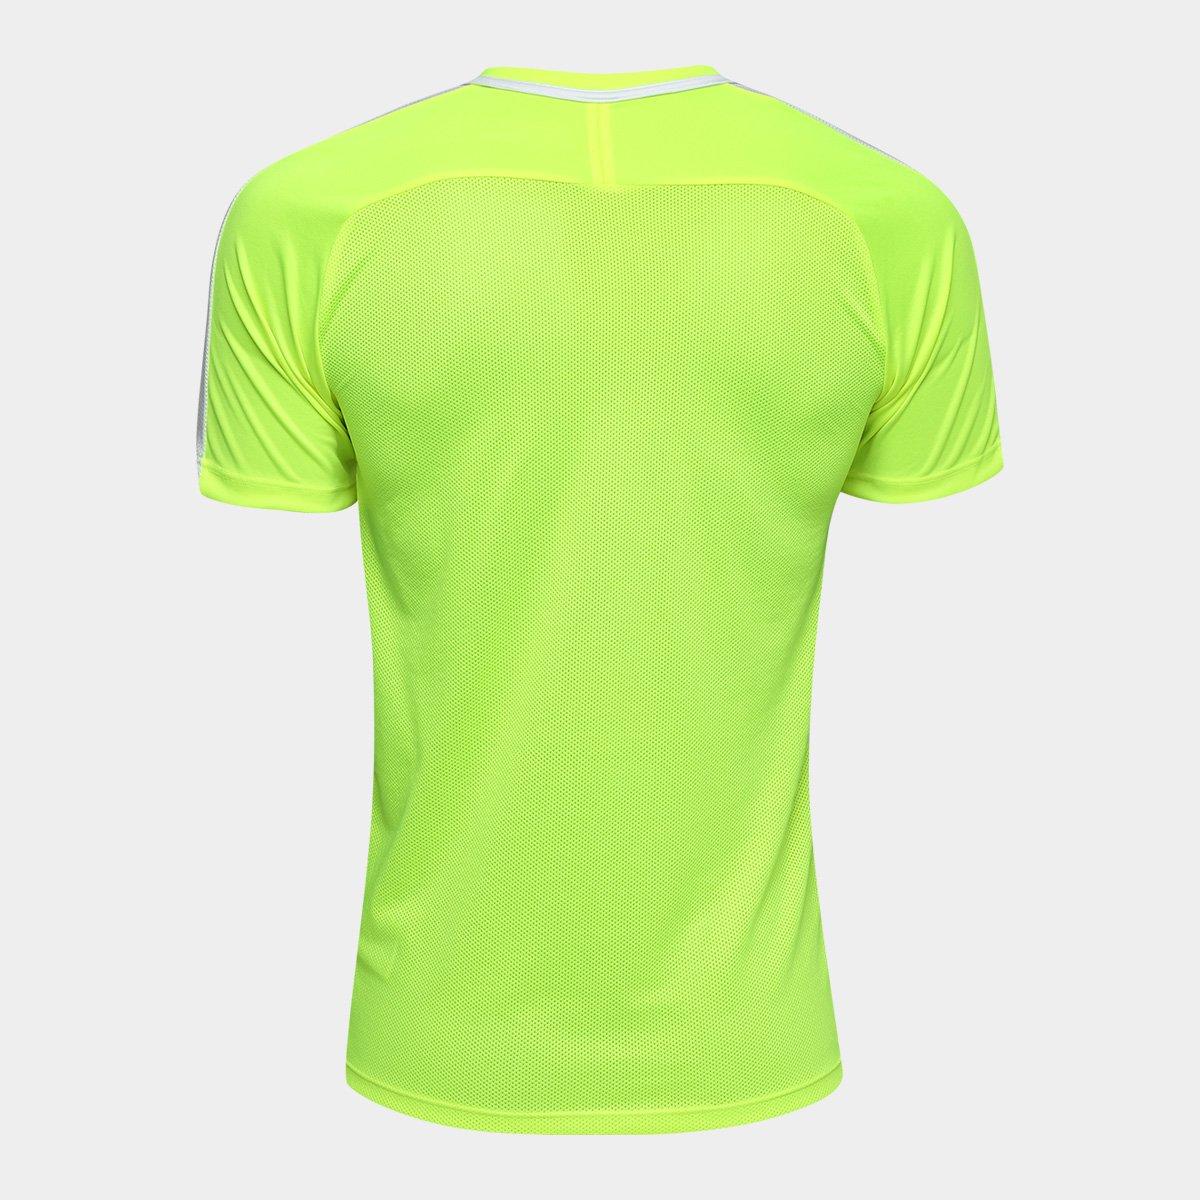 5216e5ed09 Camisa Nike Academy Masculina  Camisa Nike Academy Masculina ...